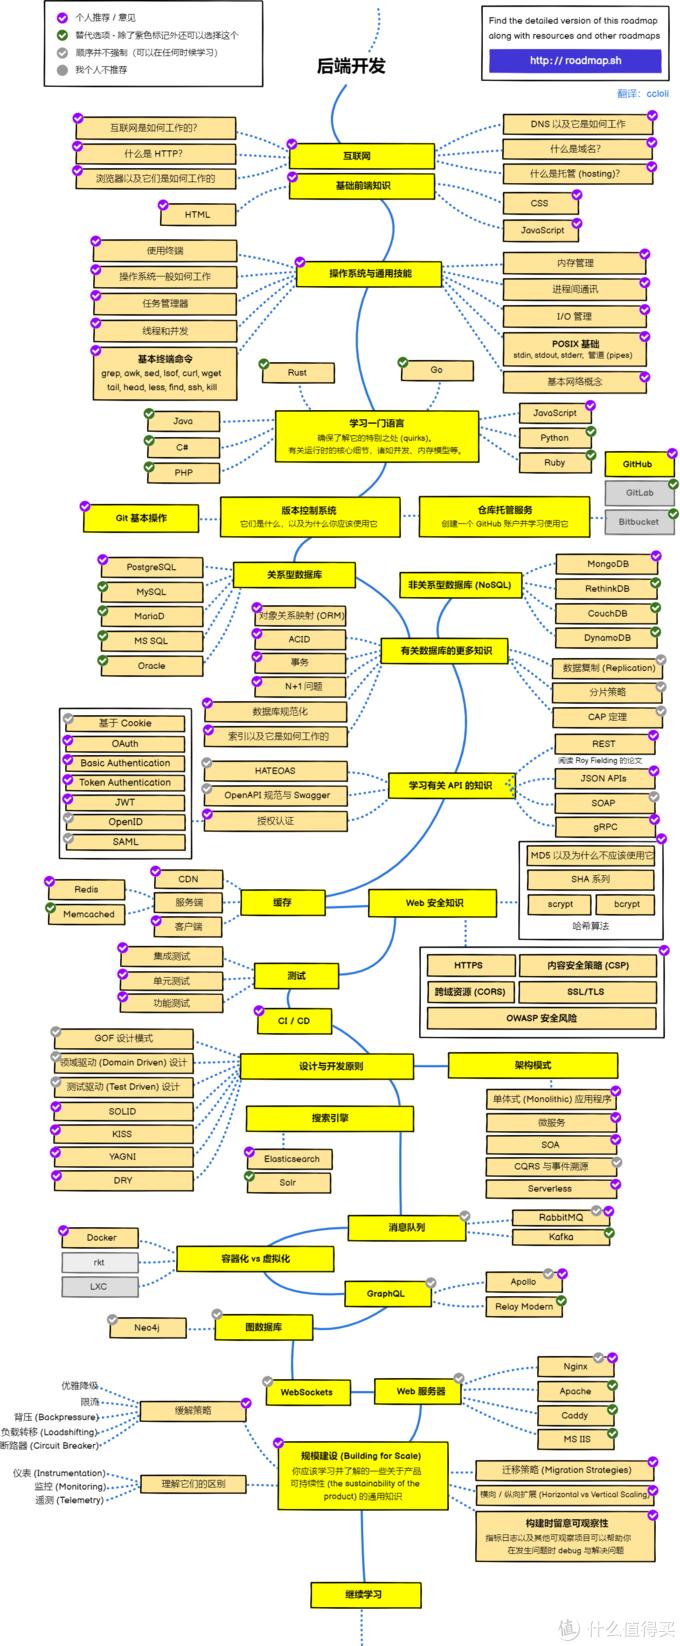 Python 太低级,我选 C++?码农奶爸带你揭穿少儿编程的骗局